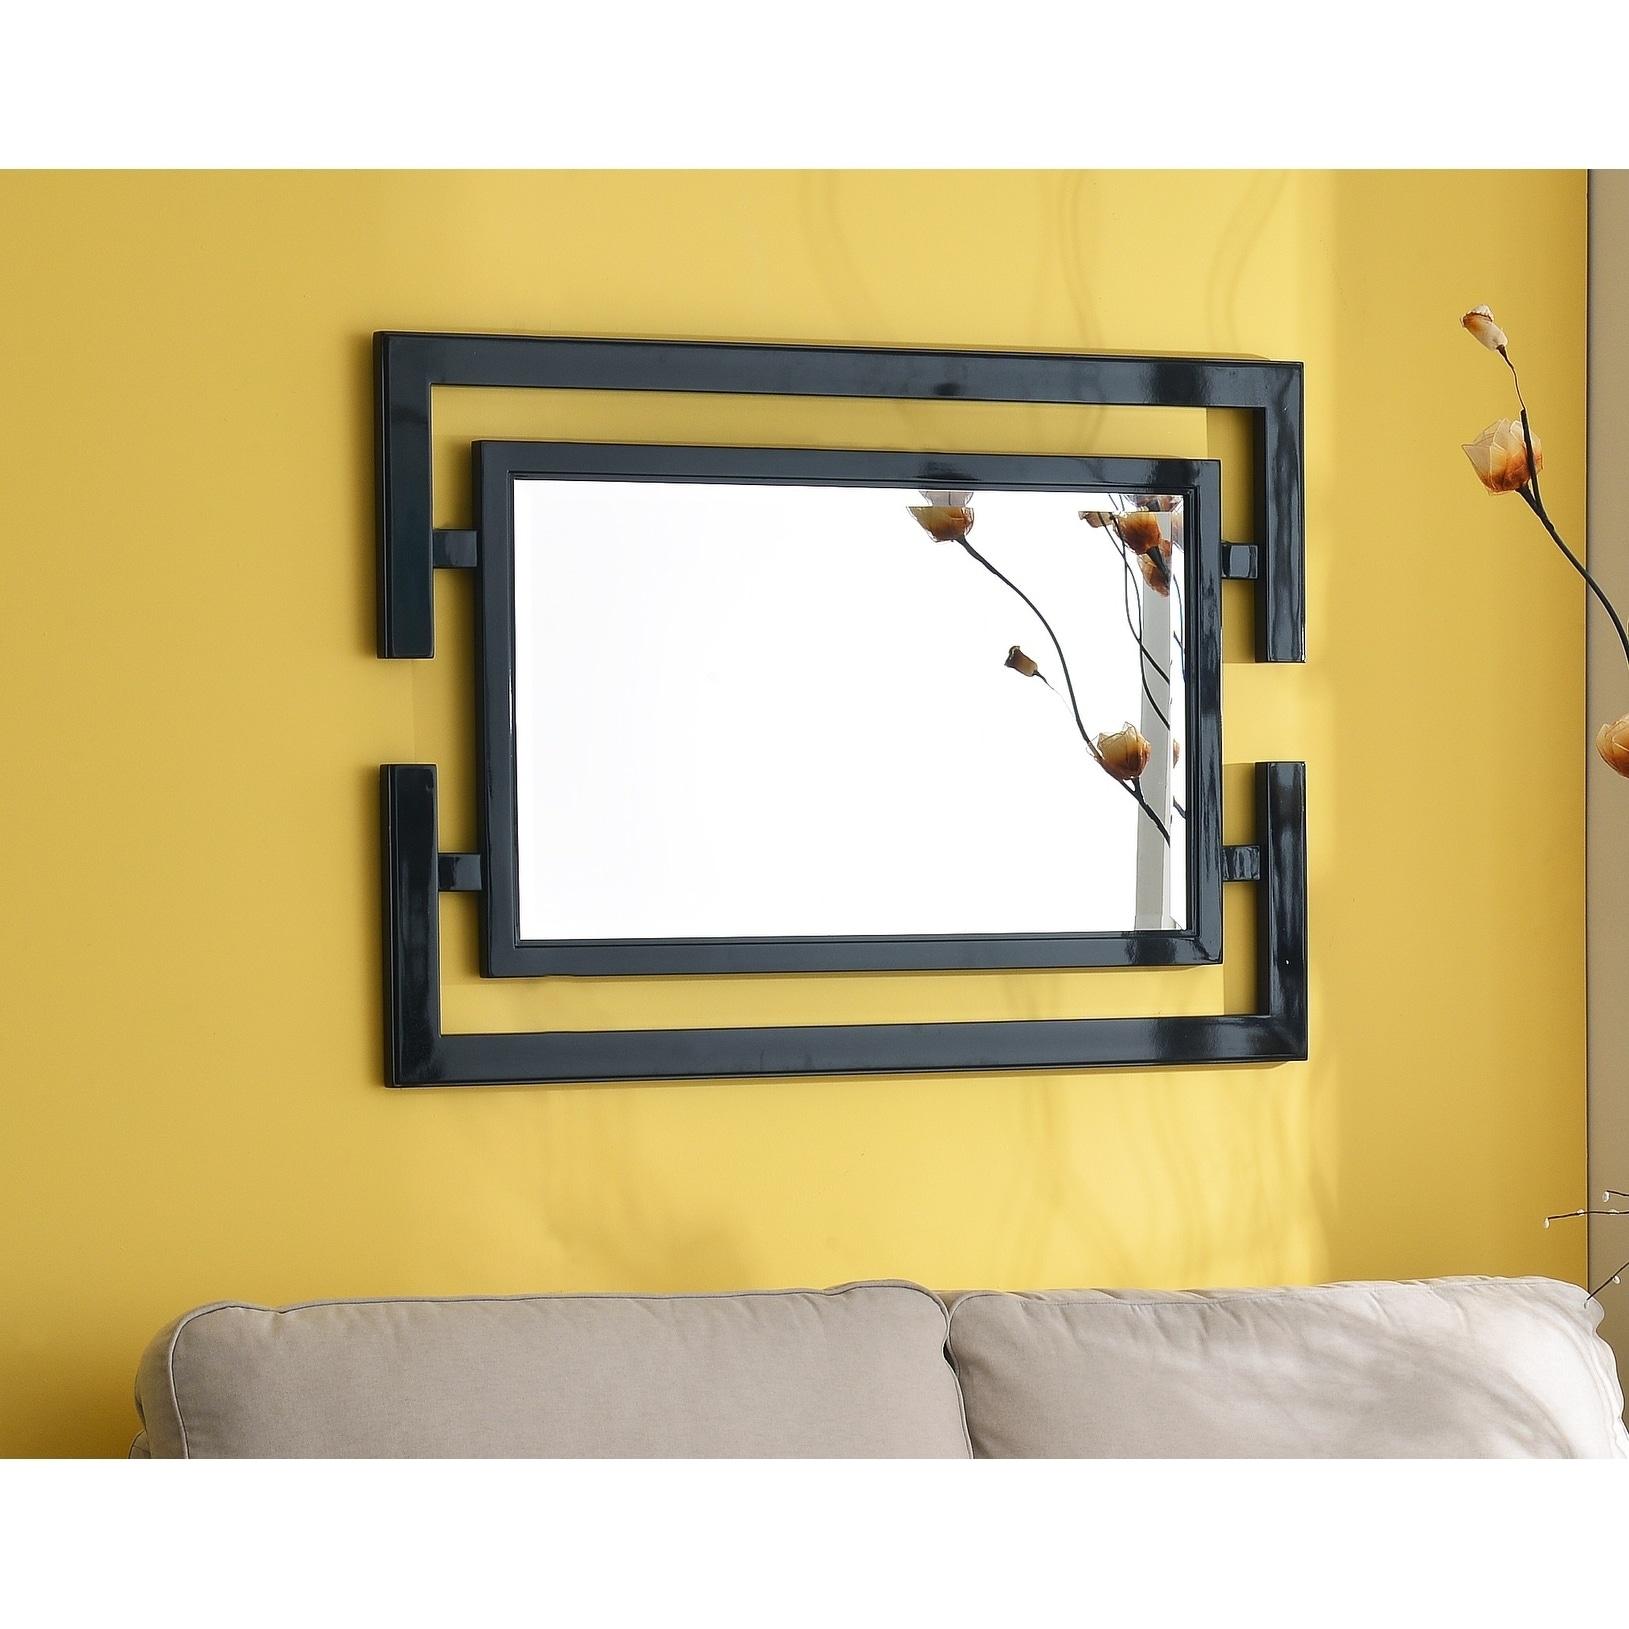 Shop Quadrate 41x29 Glossy Black Beveled Wall Mirror - Free Shipping ...